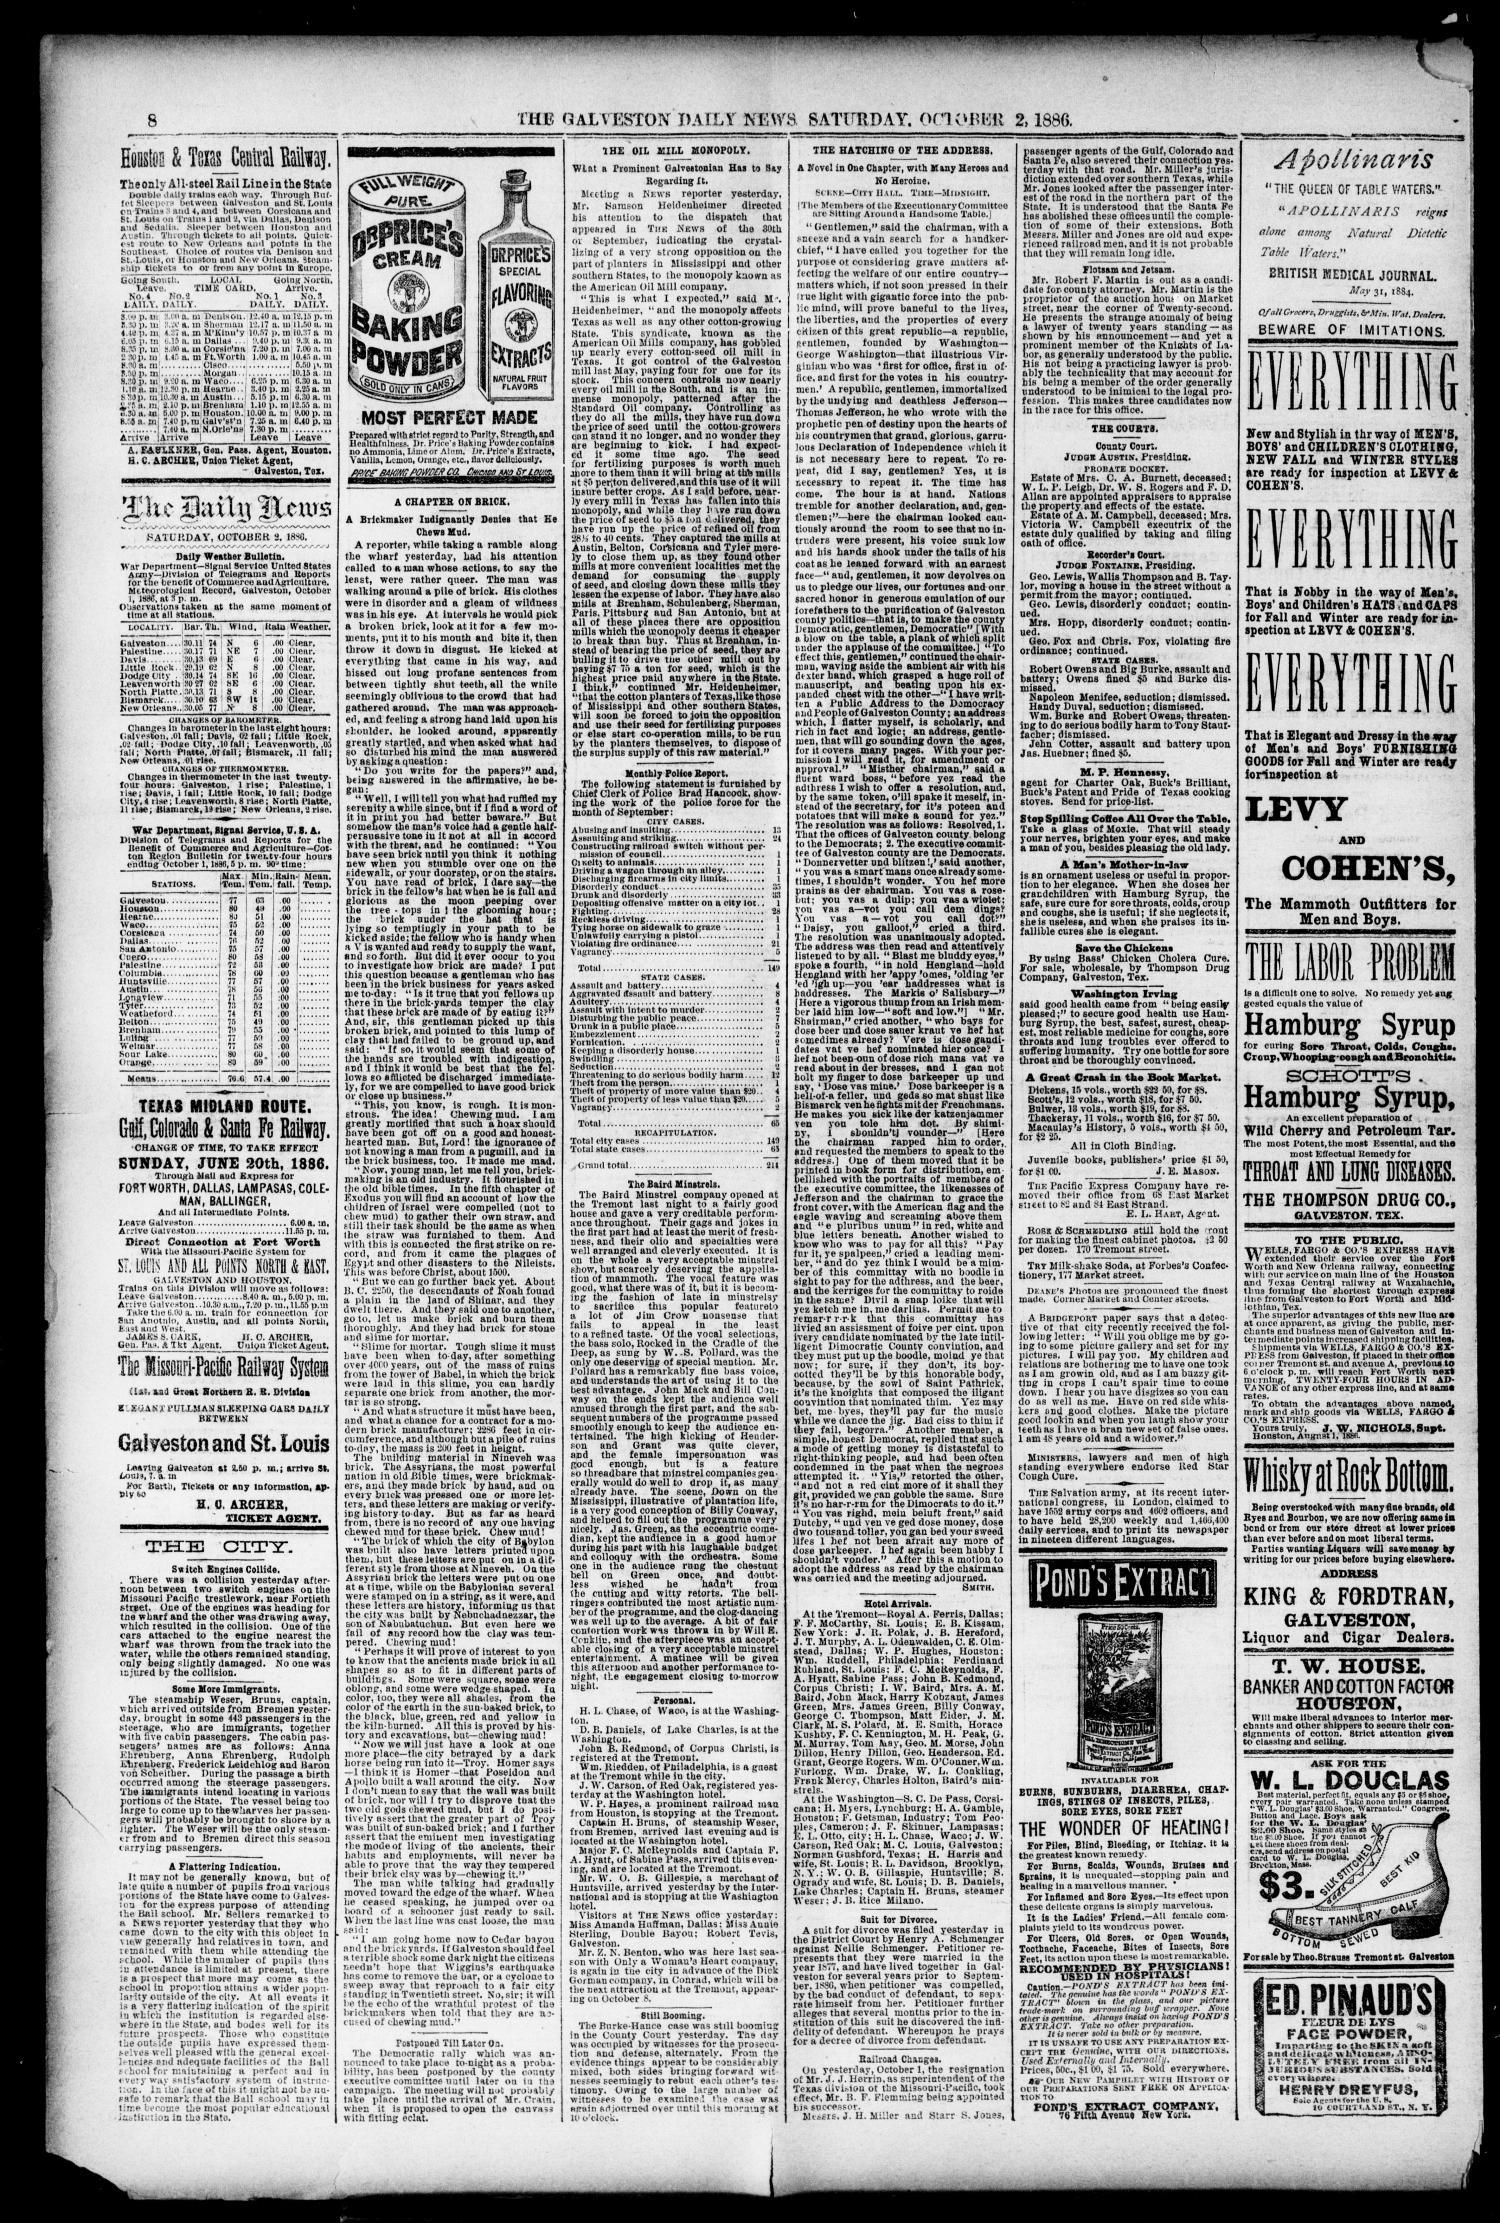 the galveston daily news galveston tex vol 45 no 160 ed 1 rh texashistory unt edu